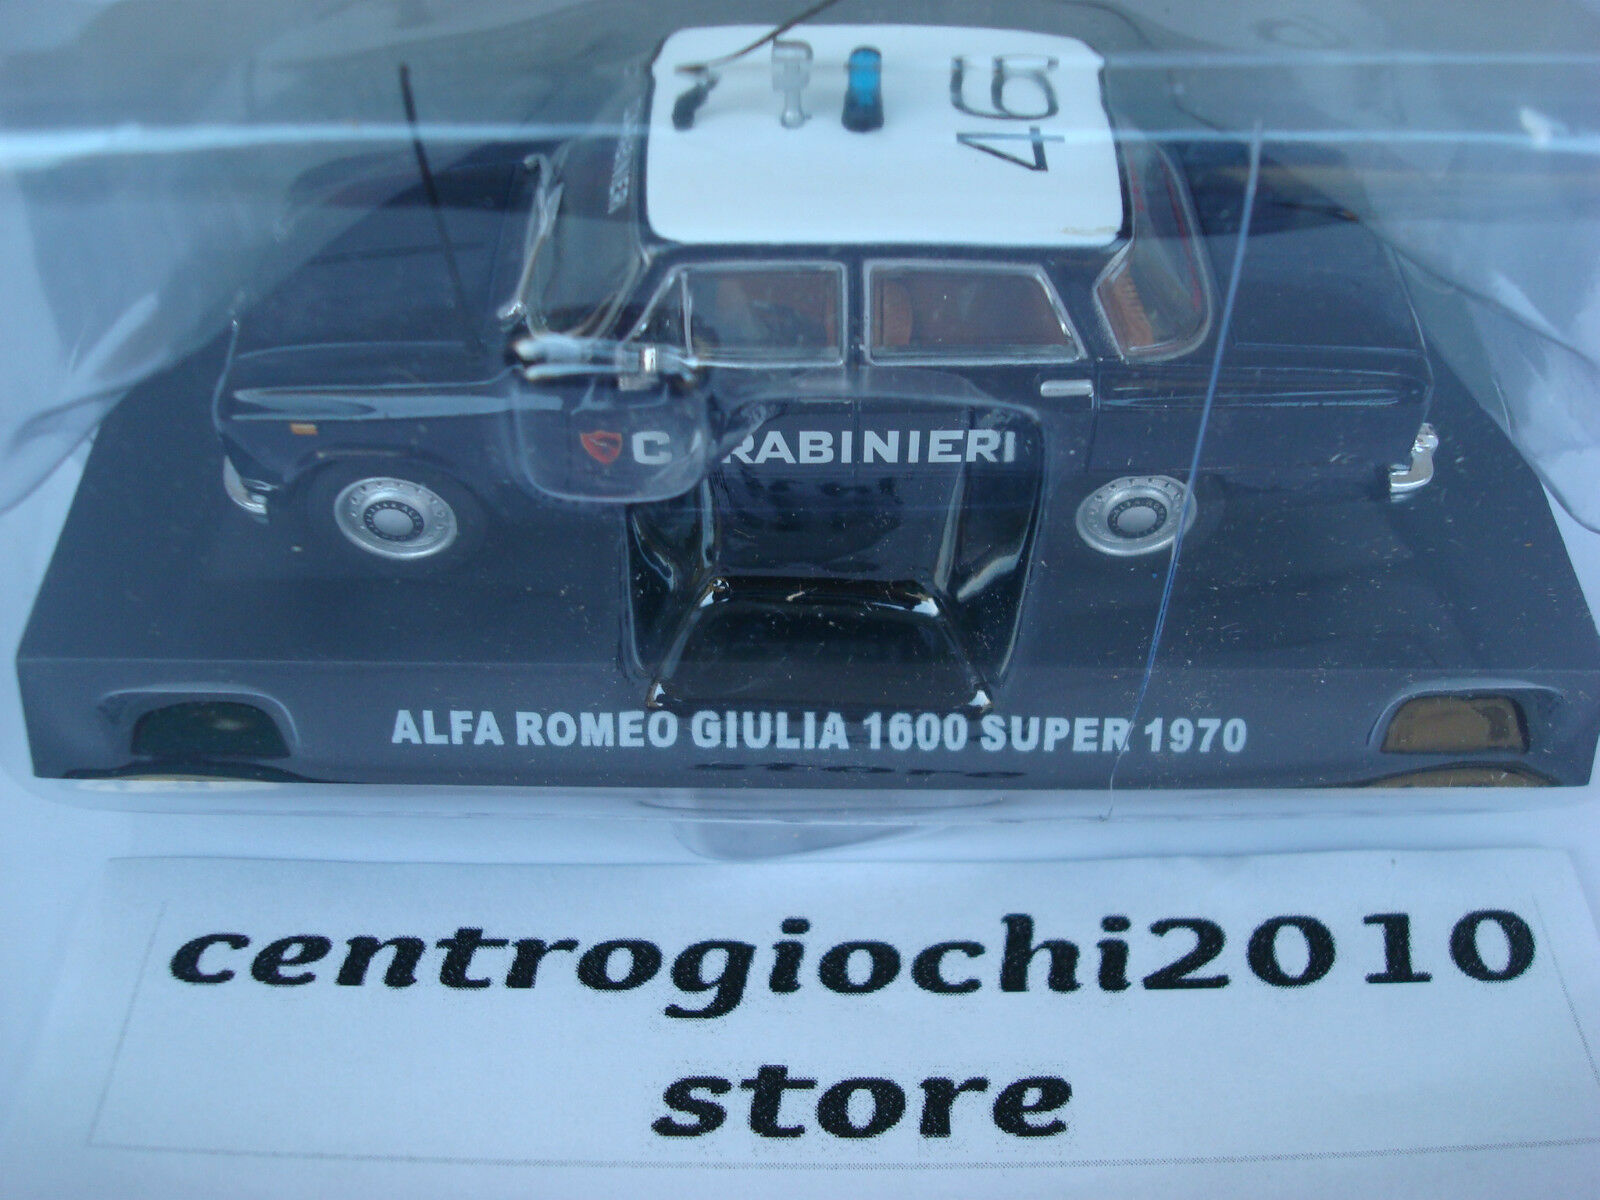 ALFA ROMEO GIULIA 1600 SUPER CARABINIERI 1970 DIE-CAST 1 43 SCALA